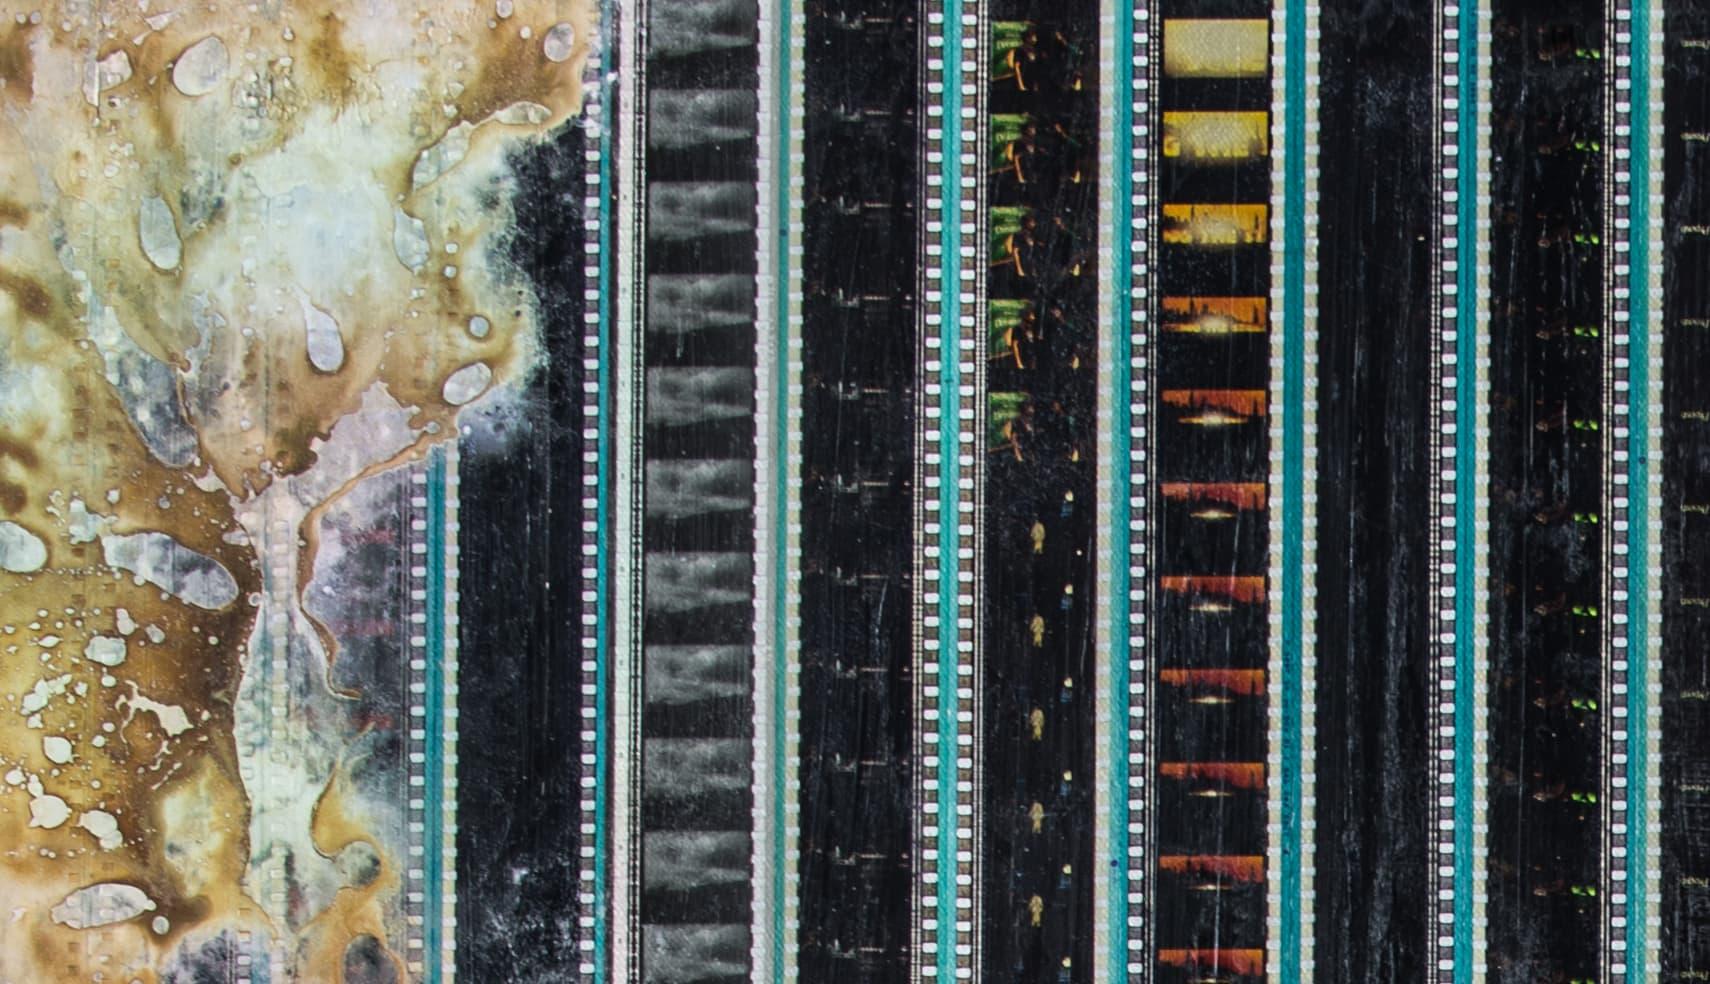 Silver Screen No. 4, detail